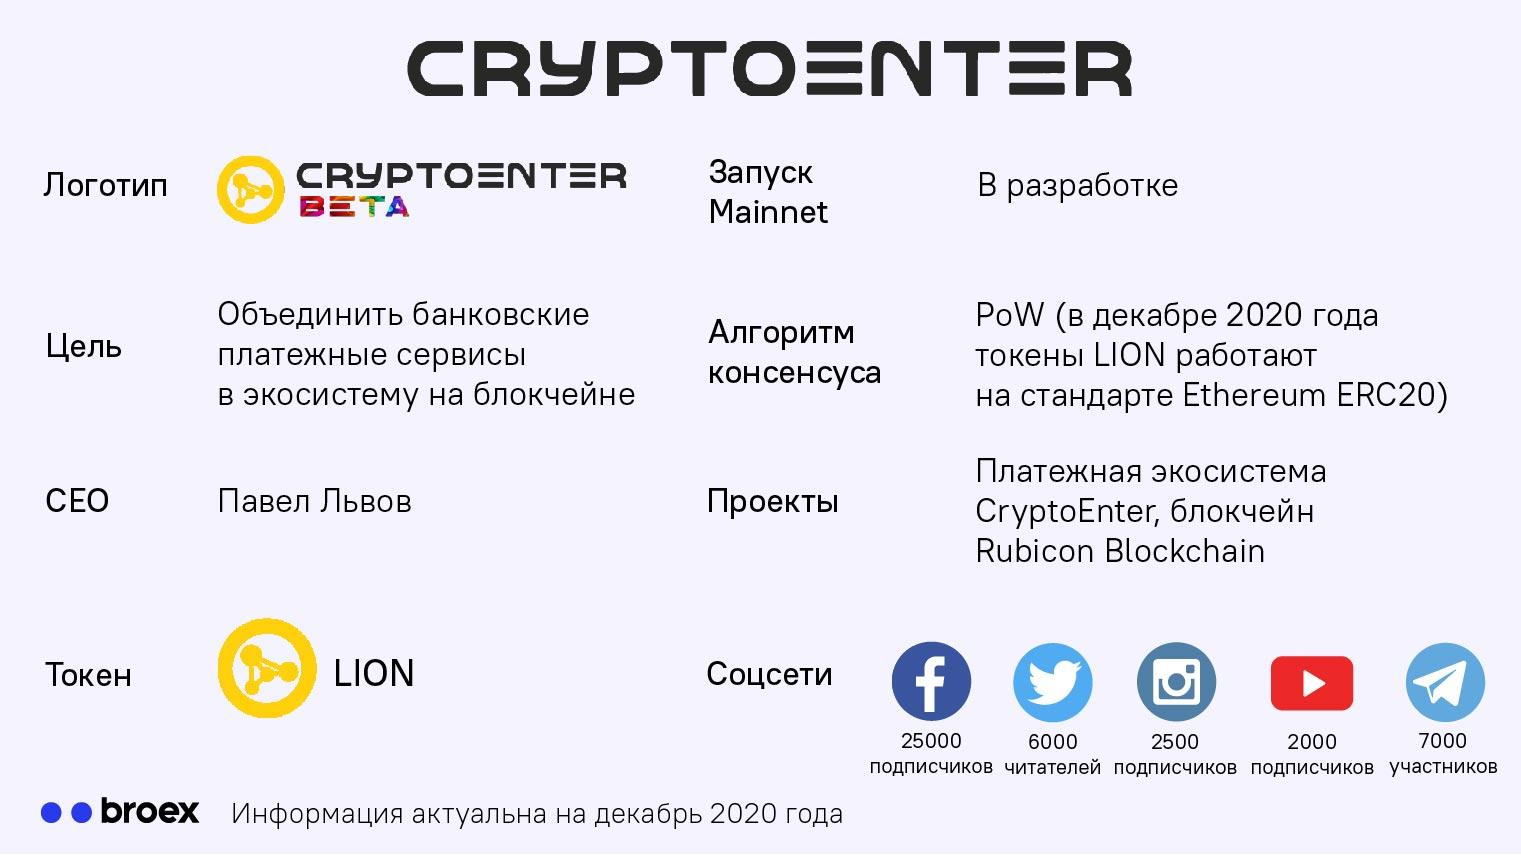 CryptoEnter